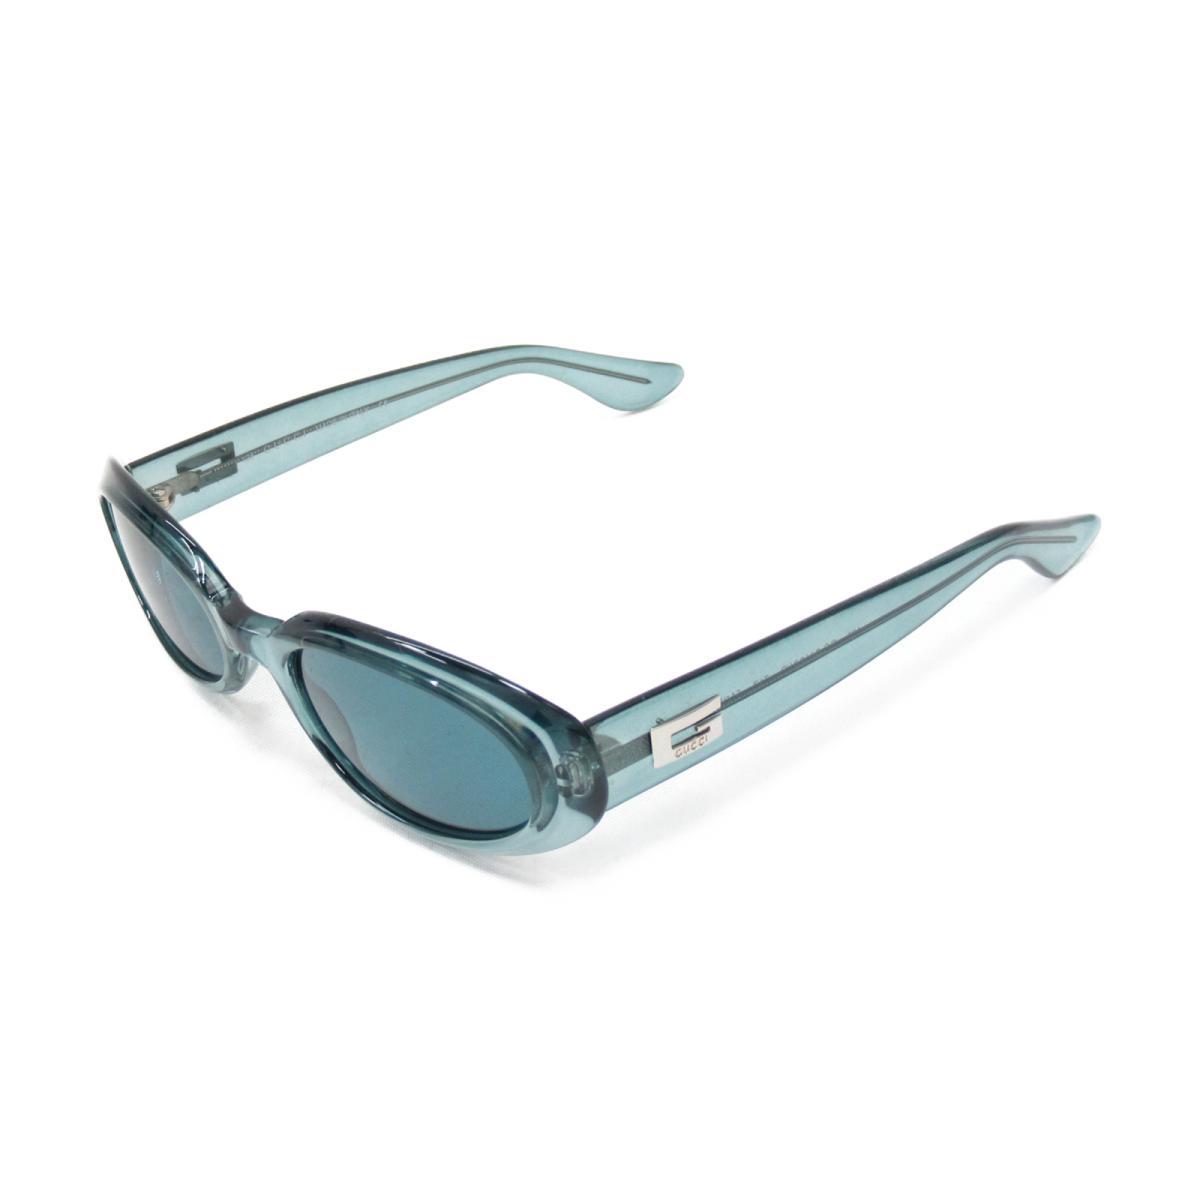 fac7dec2adab2 BRANDOFF  Gucci sunglasses accessories lady s plastic blue (GG2419 ...